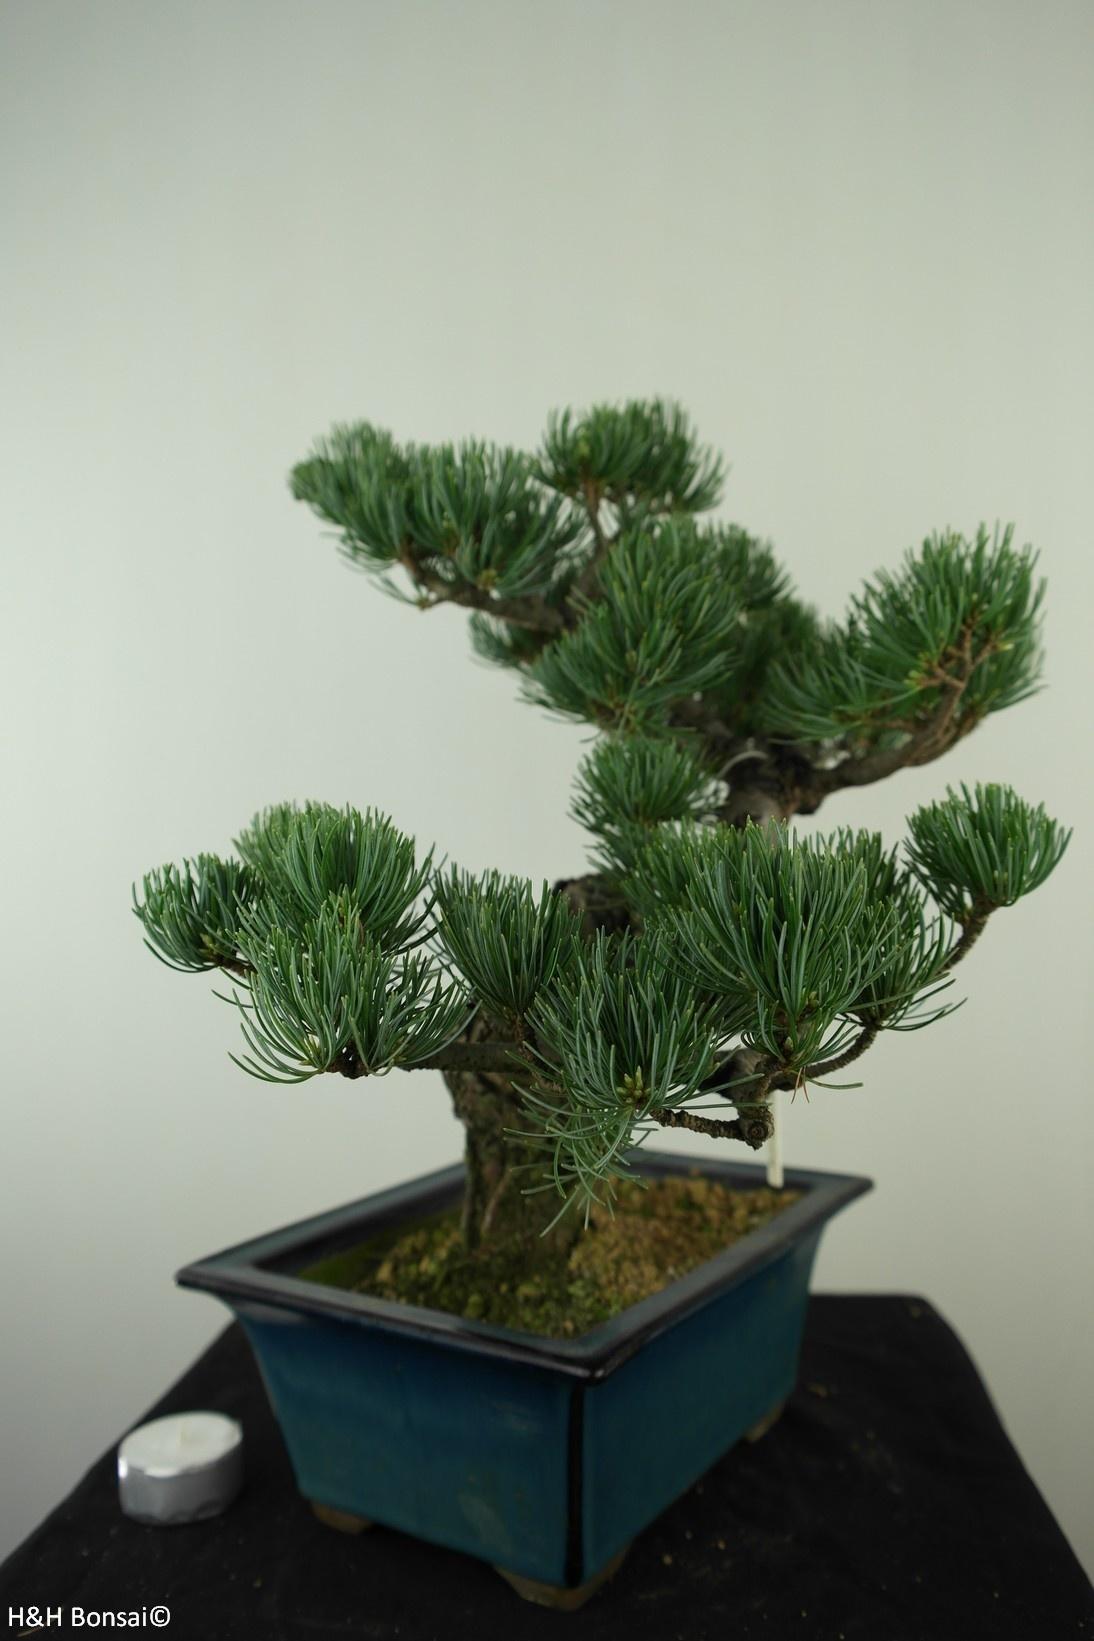 Bonsai Pino bianco, Pinus pentaphylla, no. 7812